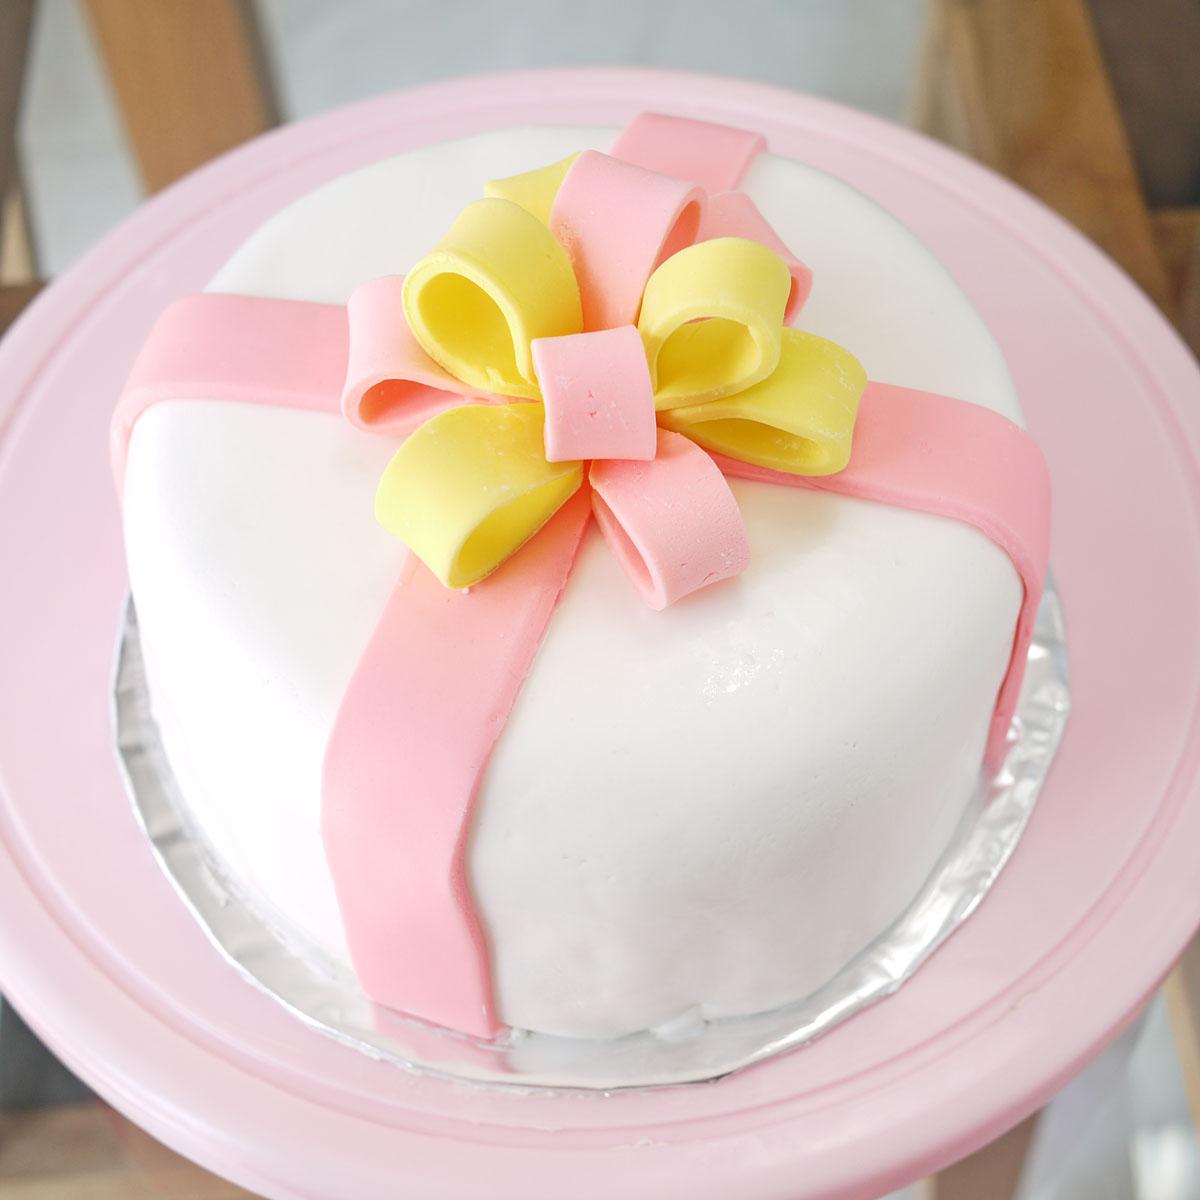 8 Fondant Flower Design Easy Cakes To Go For It Around ...